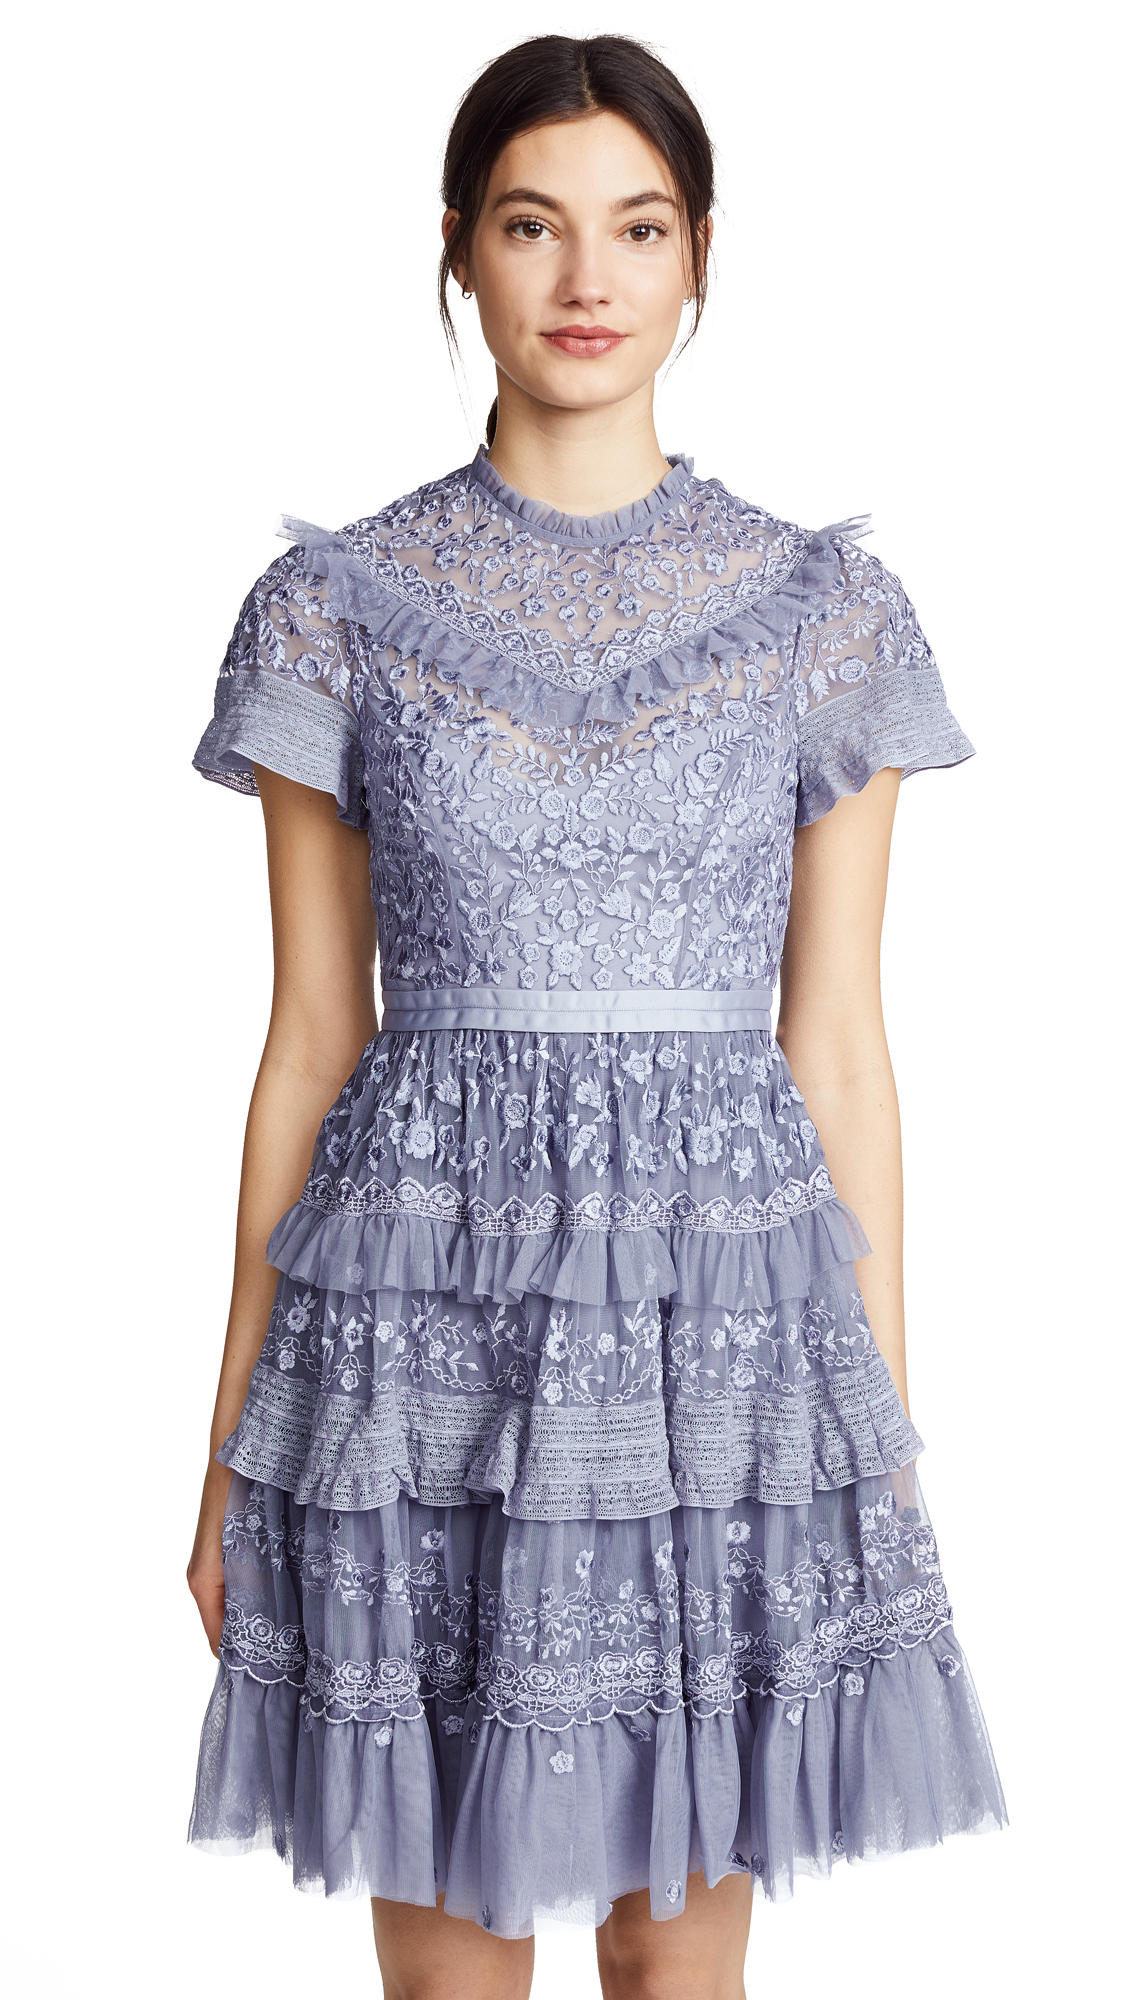 Needle & Thread Iris Dress